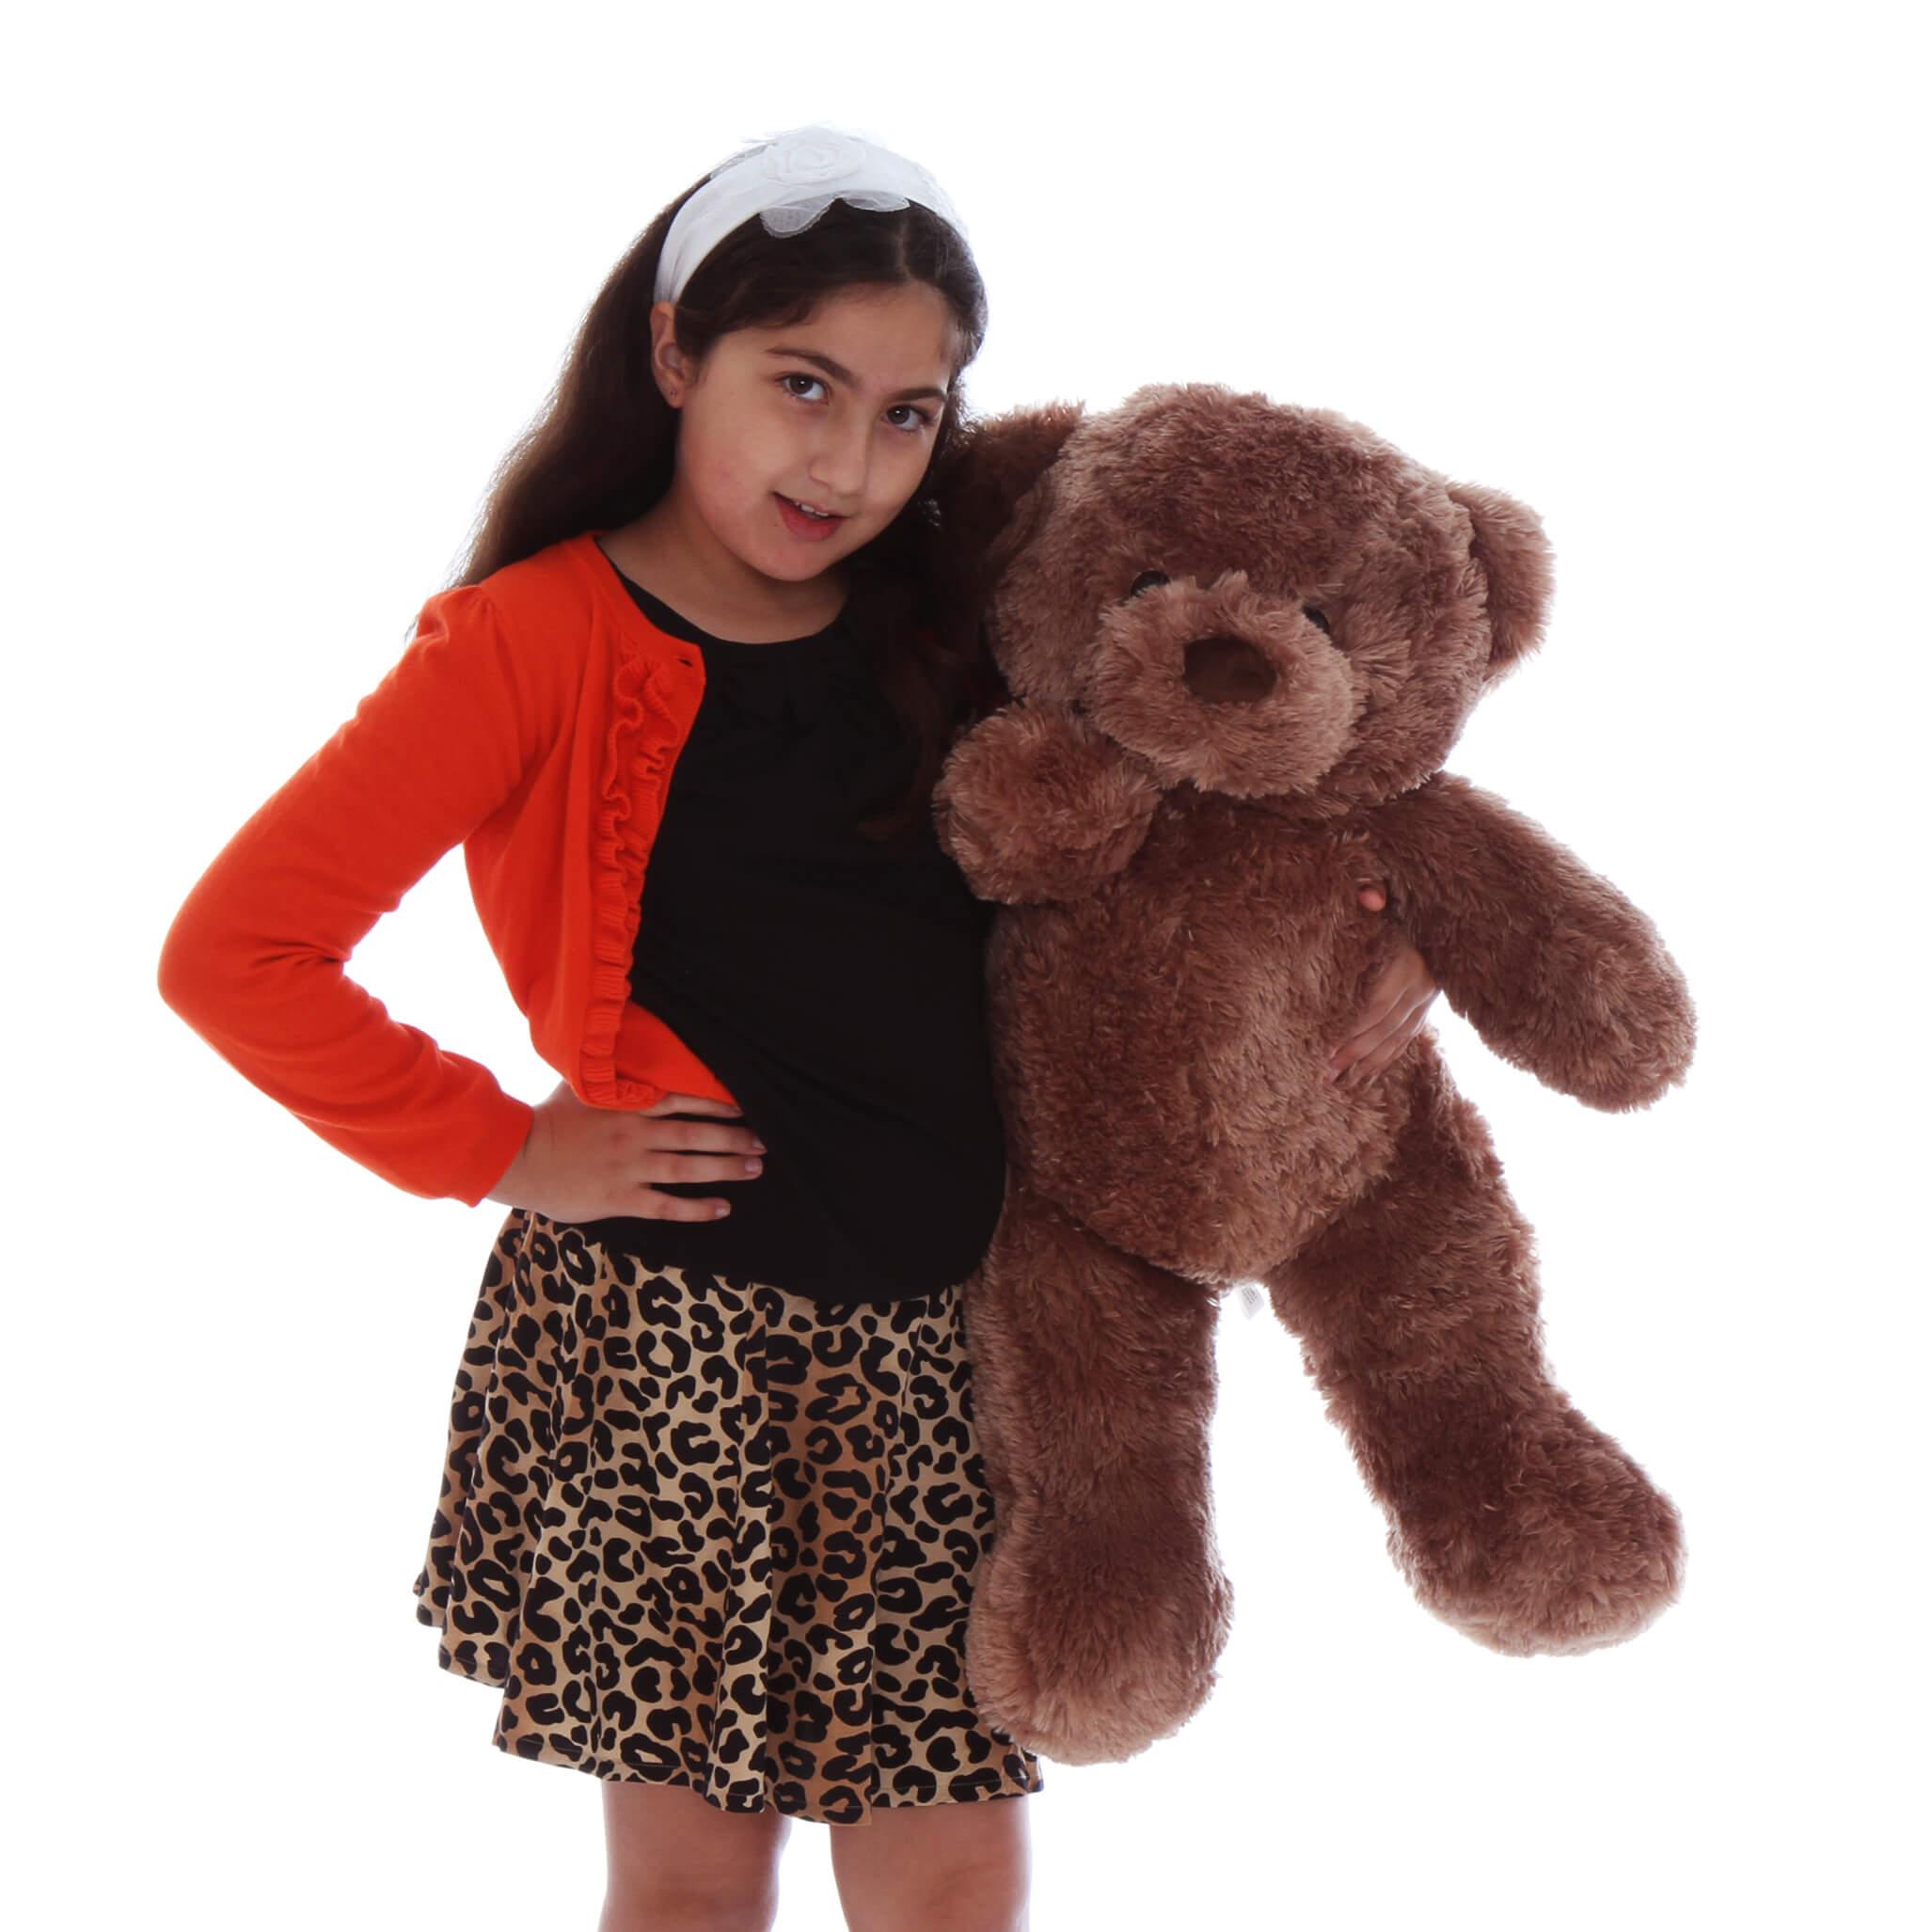 enormously-big-2-ft-huggable-and-soft-teddy-bear-mocha-brown-big-chubs-1.jpg